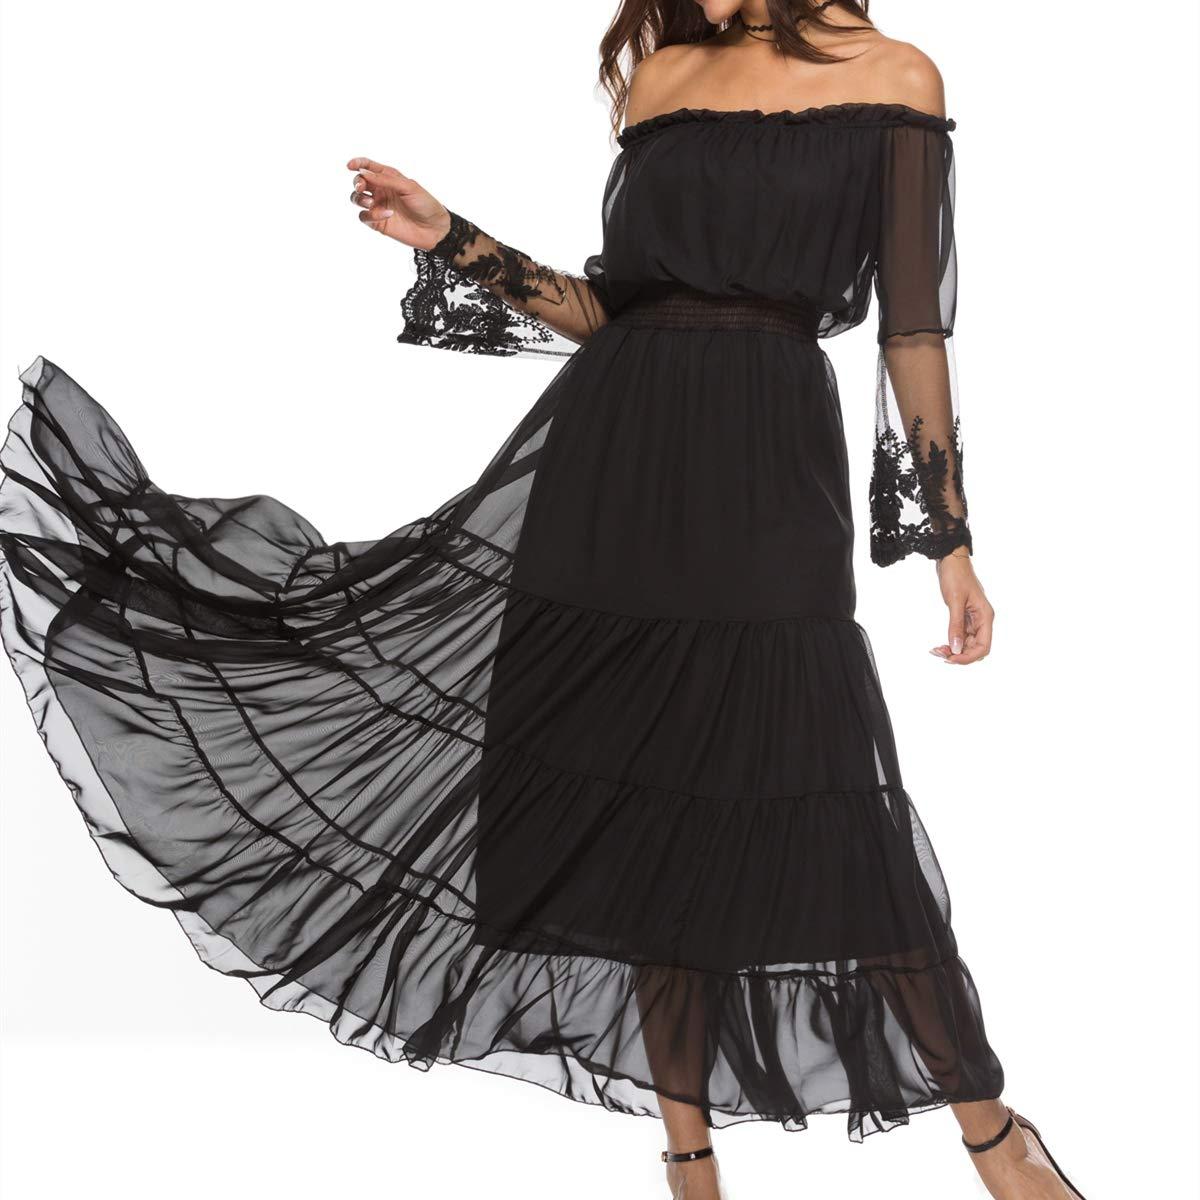 364c3df416f Amazon.com  LADY ANGEL Women Black Sheer Mesh Off The Shoulder Lace Panel  Ruffle Hem Long Sleeve Maxi Dress  Clothing